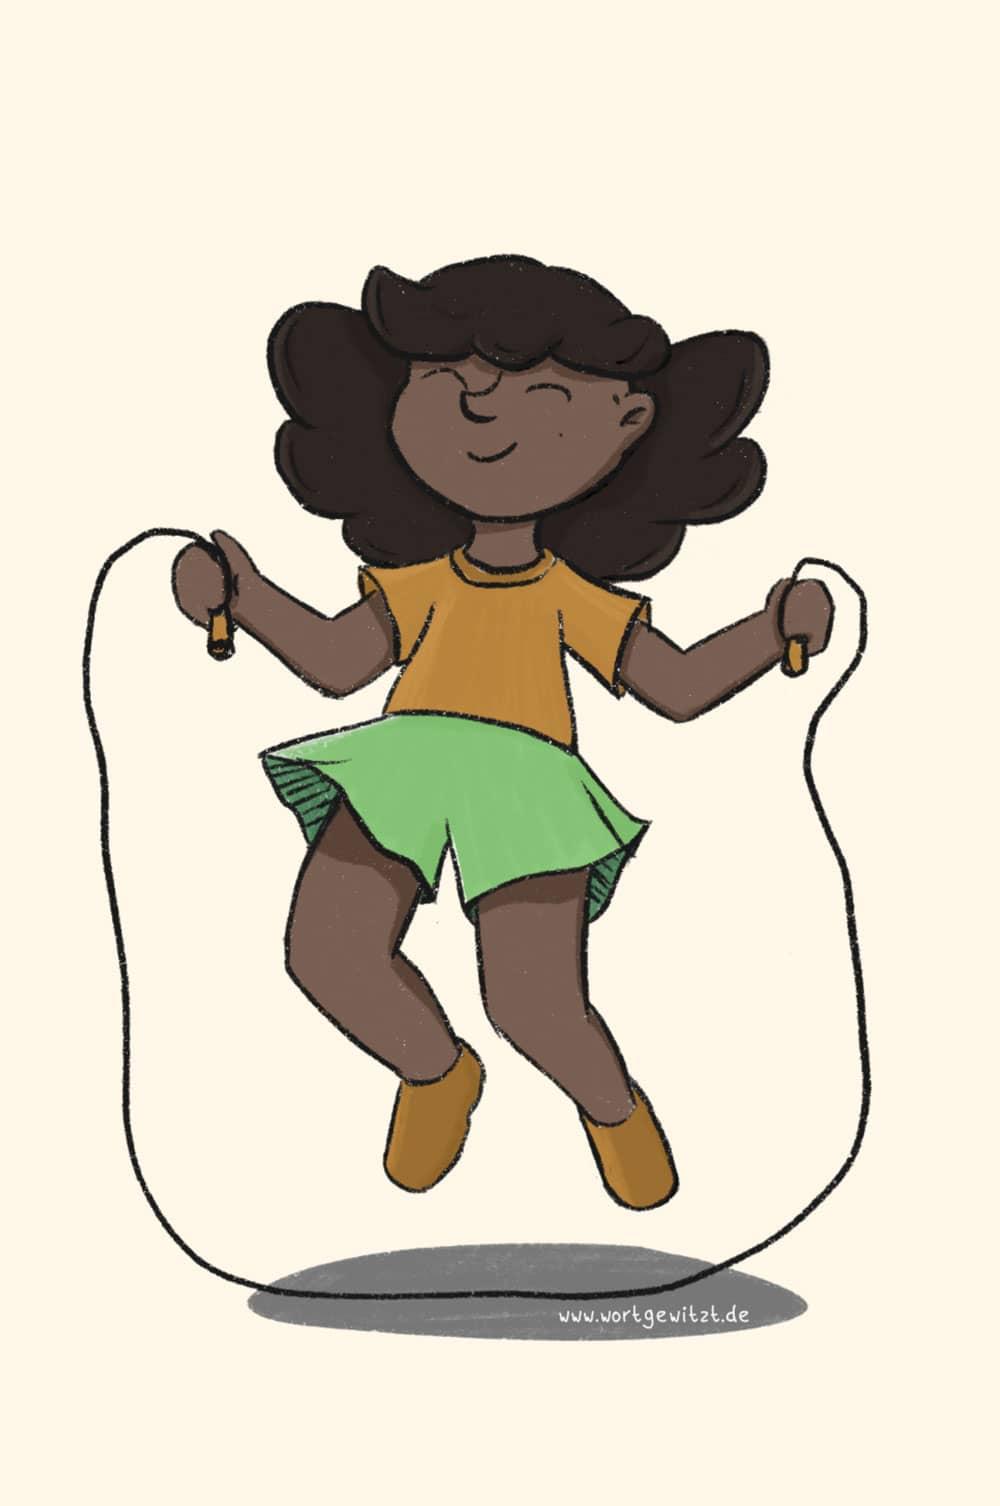 Illustration seilspringendes Mädchen